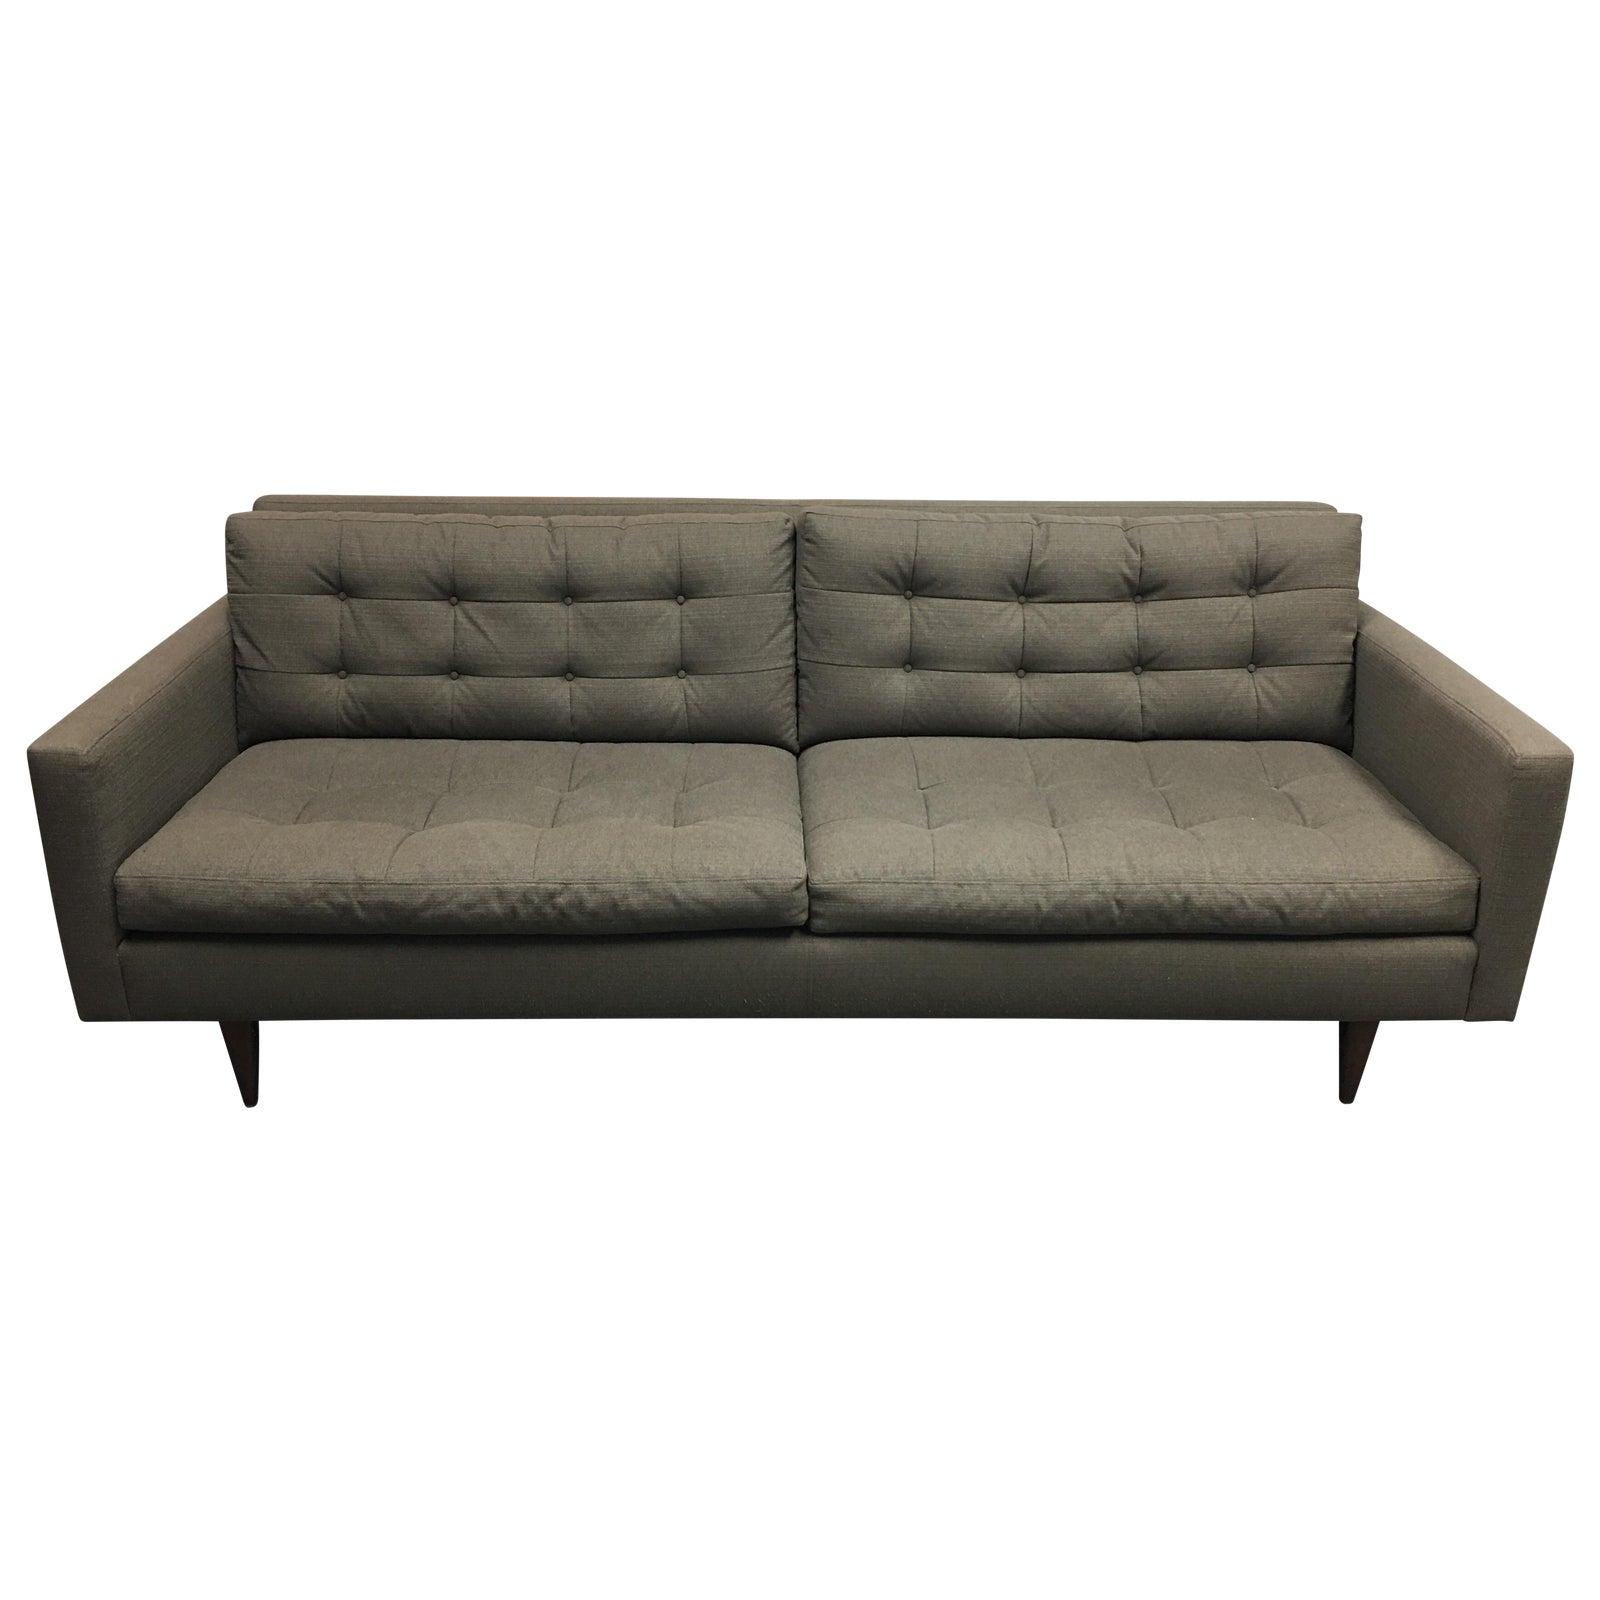 Crate barrel petrie apartment sofa chairish